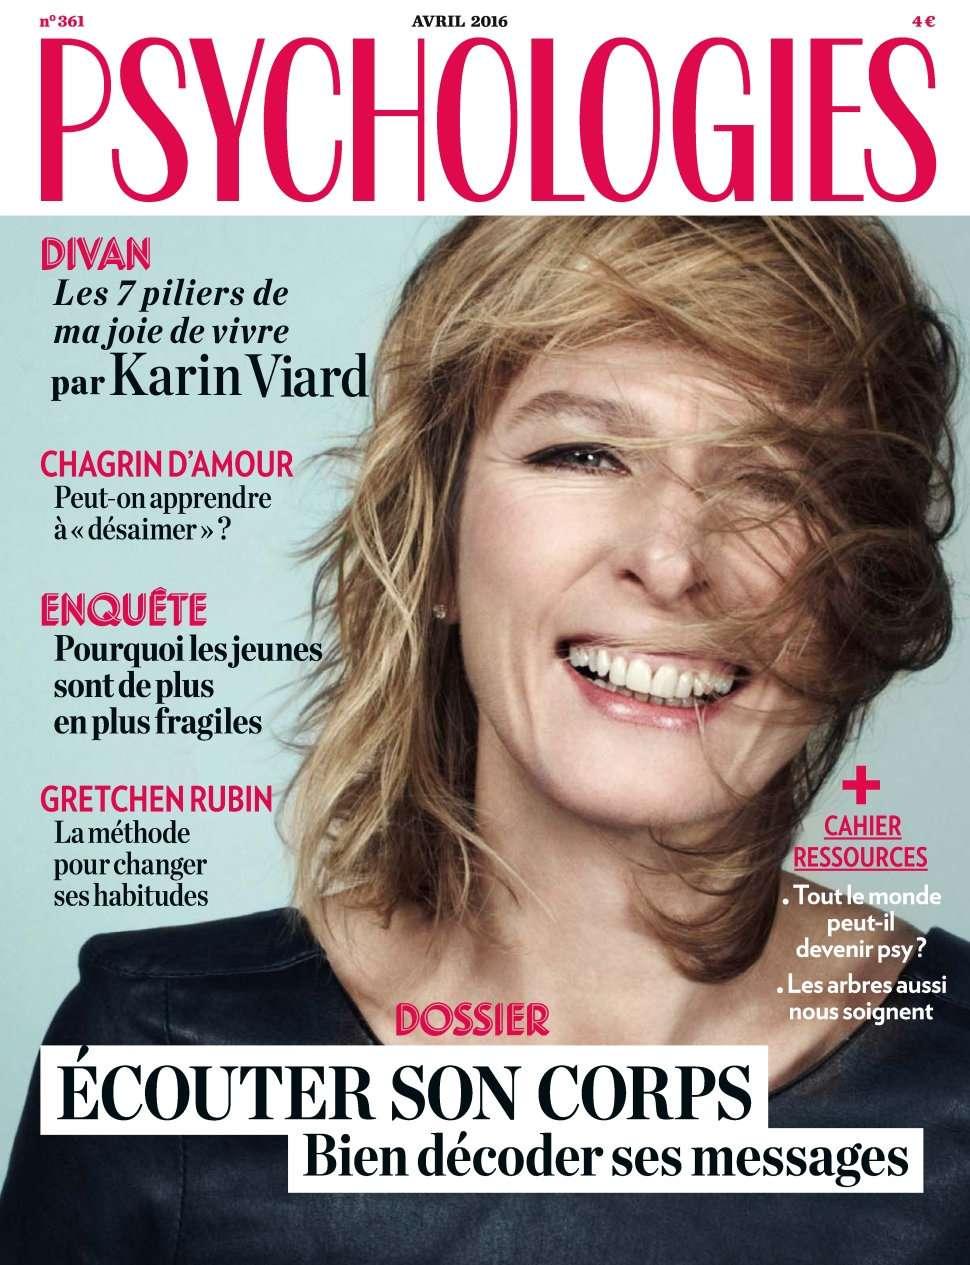 Psychologies Magazine 361 - Avril 2016